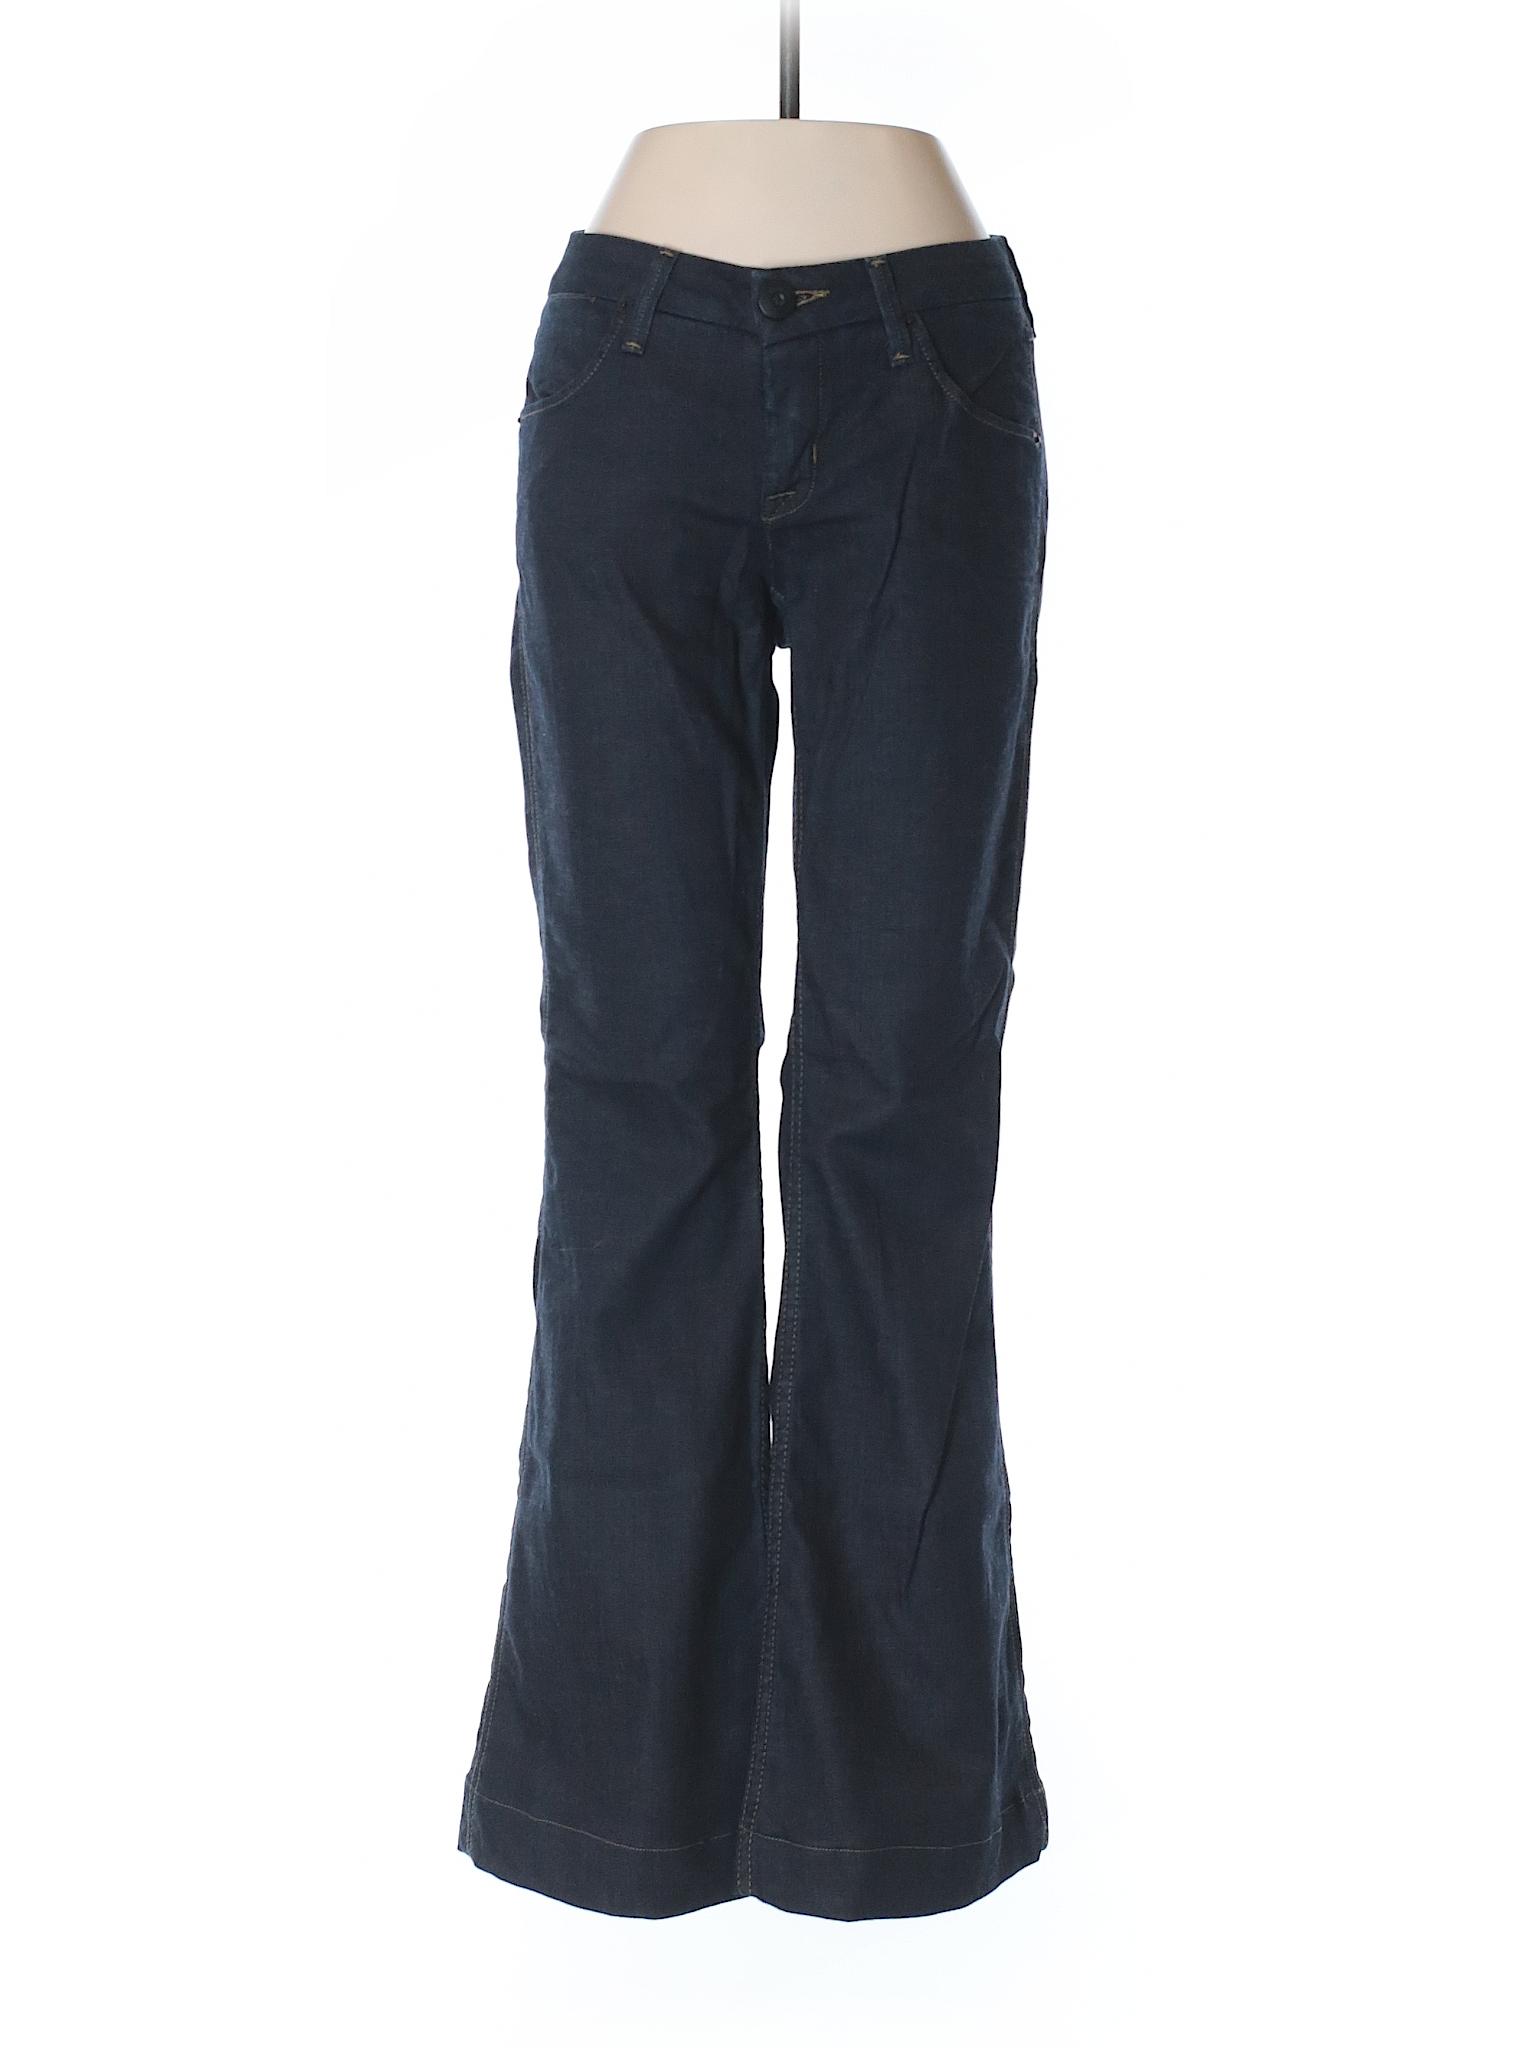 Jeans Hudson Jeans Jeans Hudson Promotion Hudson Promotion Promotion wESTx8q8